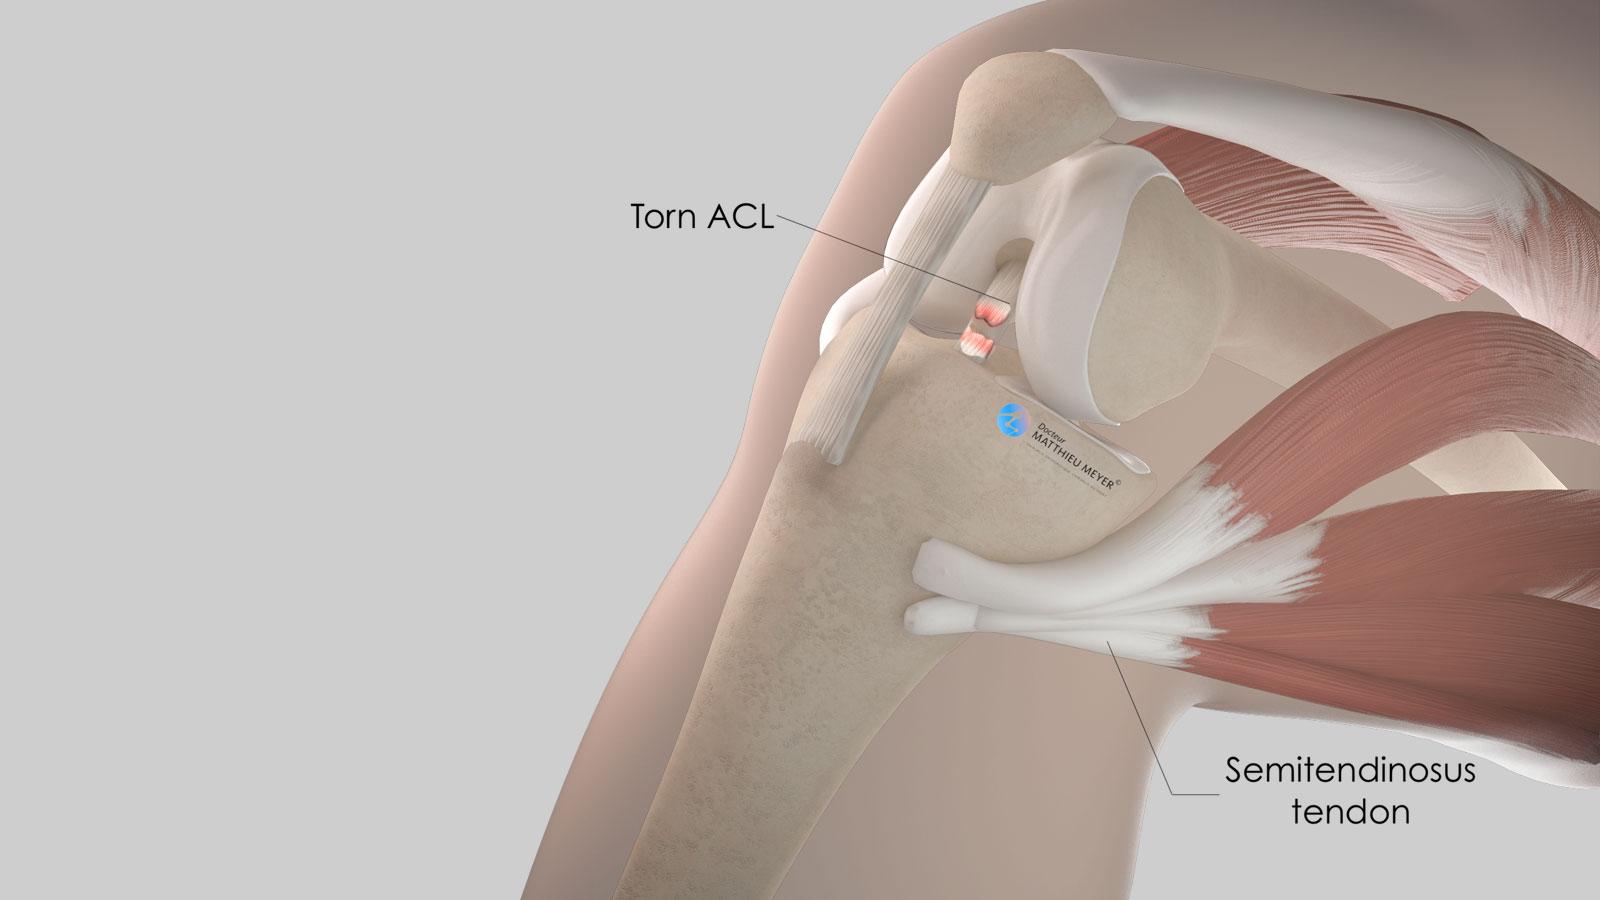 Location of the semitendinosus tendon